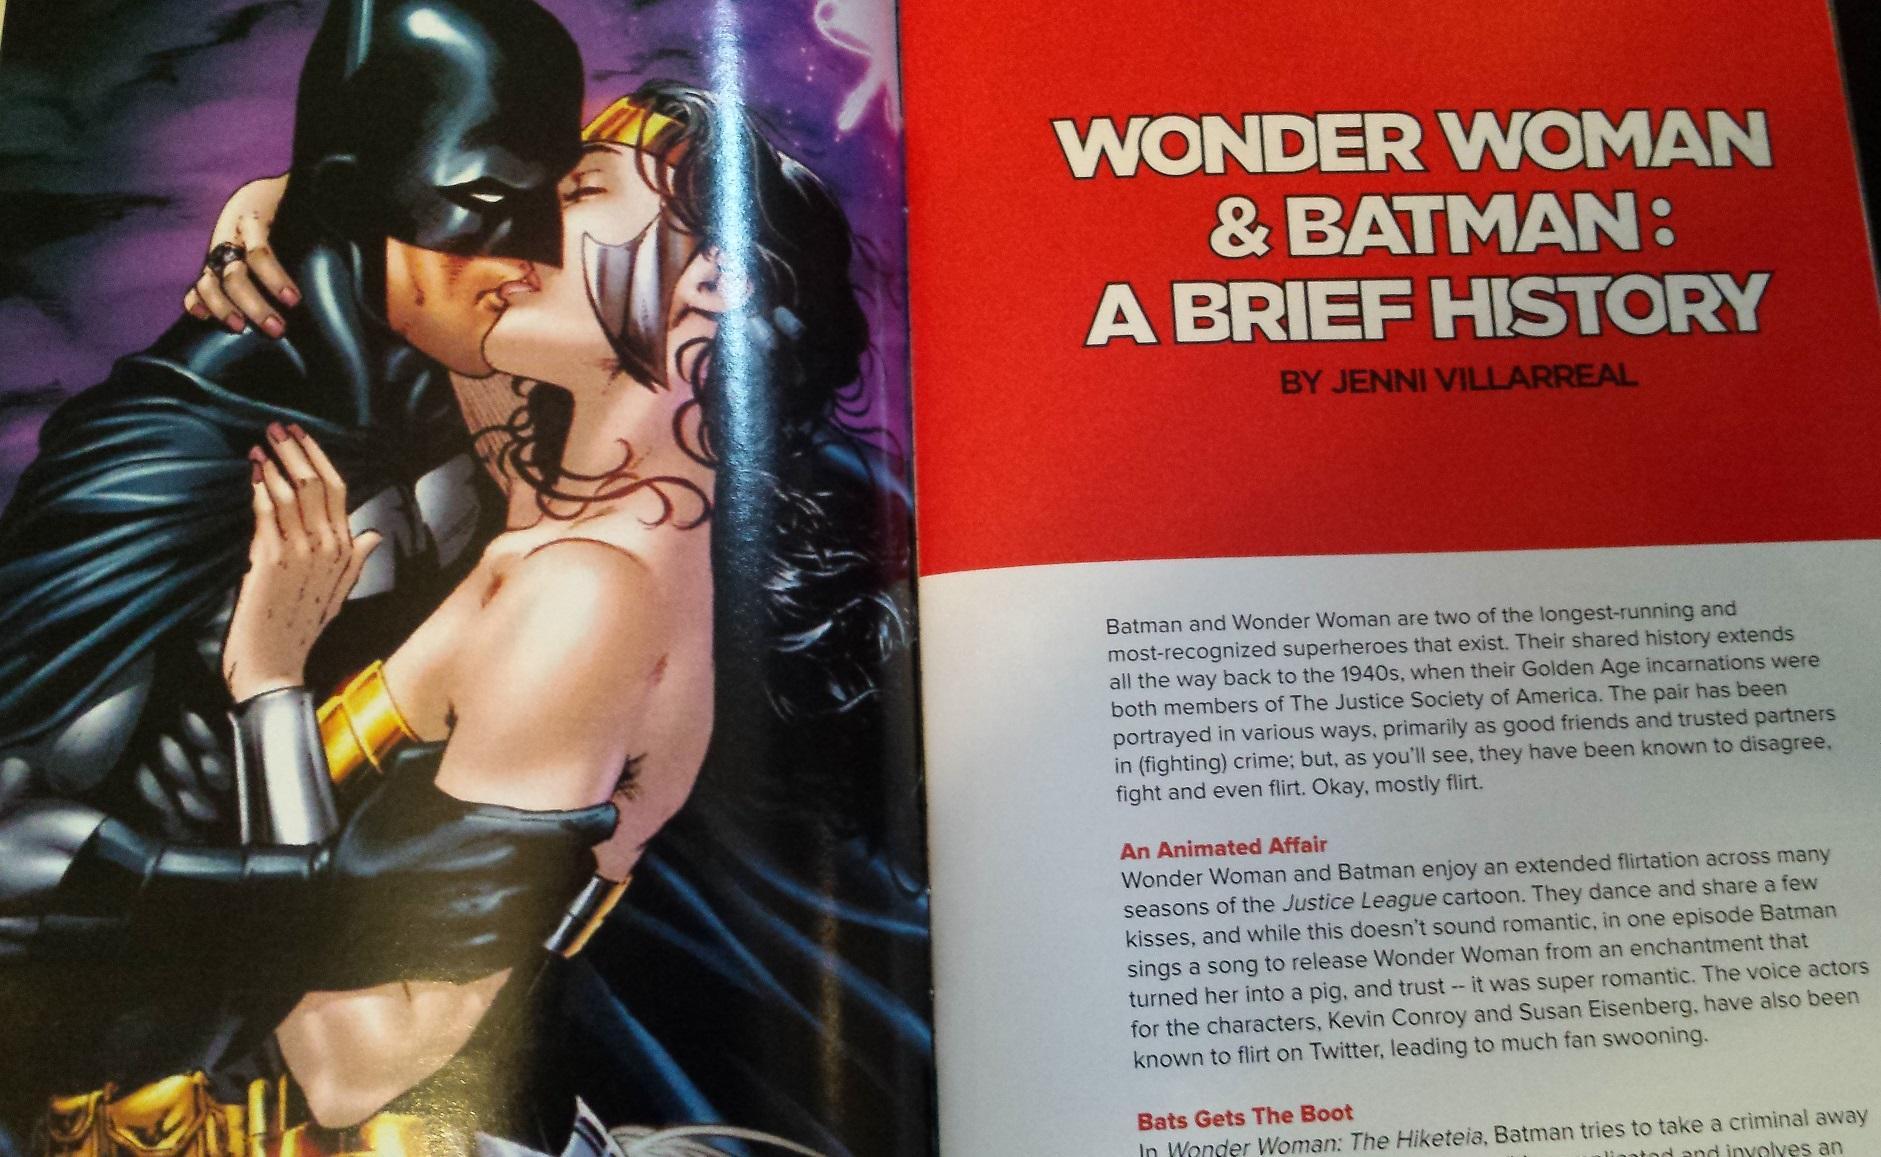 Wonder woman and batman making out